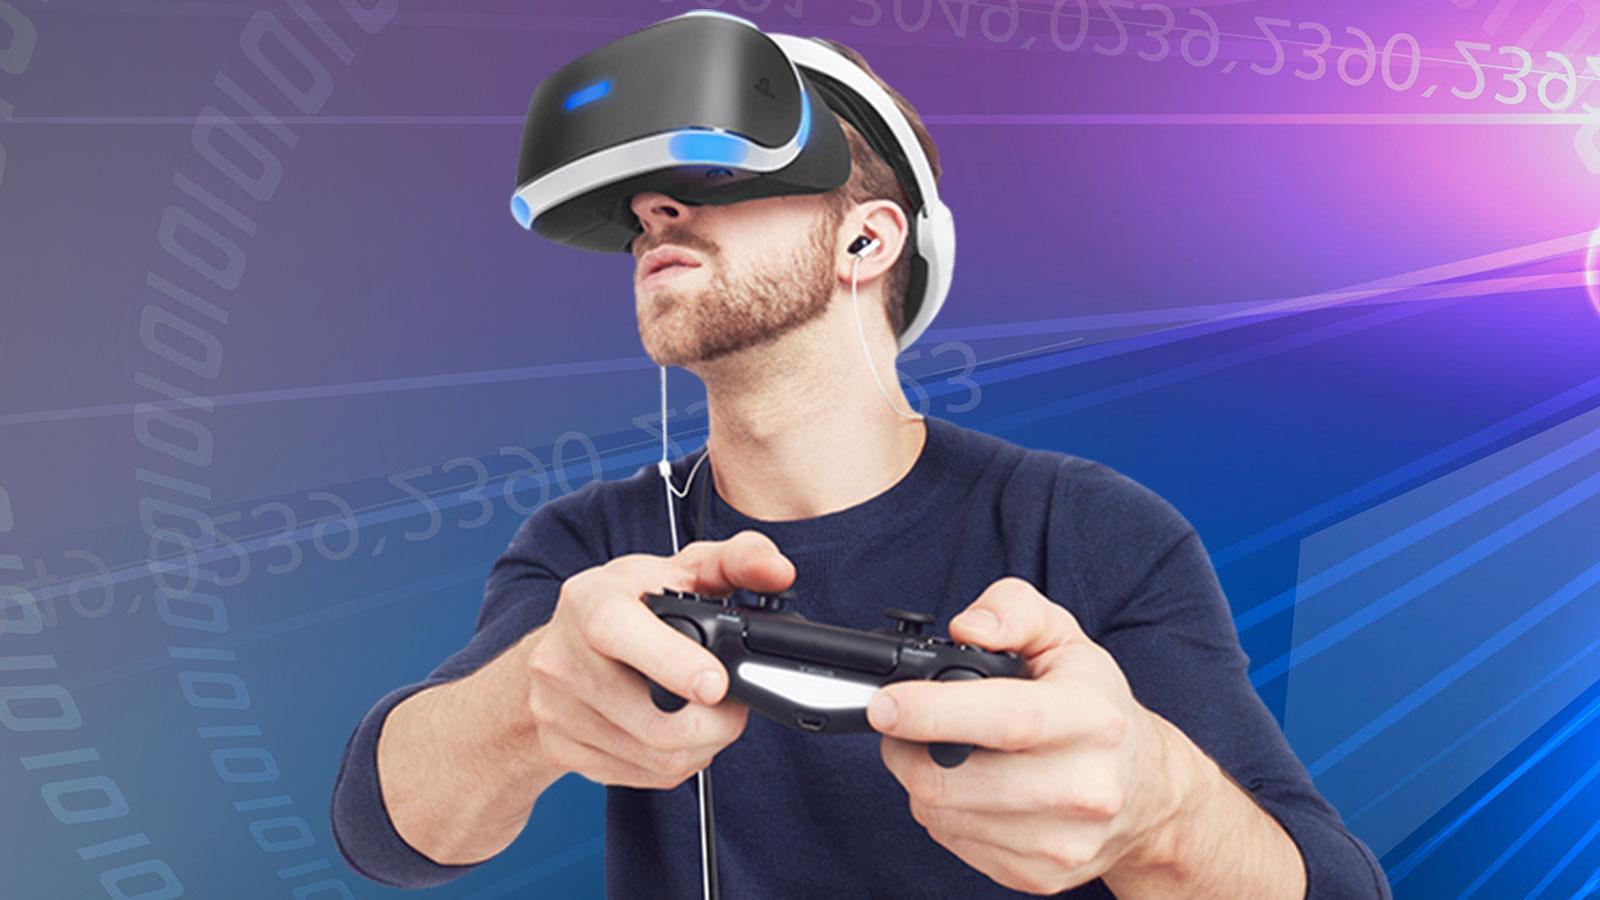 Conheça as características, preço e desempenho dos óculos de realidade virtual Sony PlayStation VR.